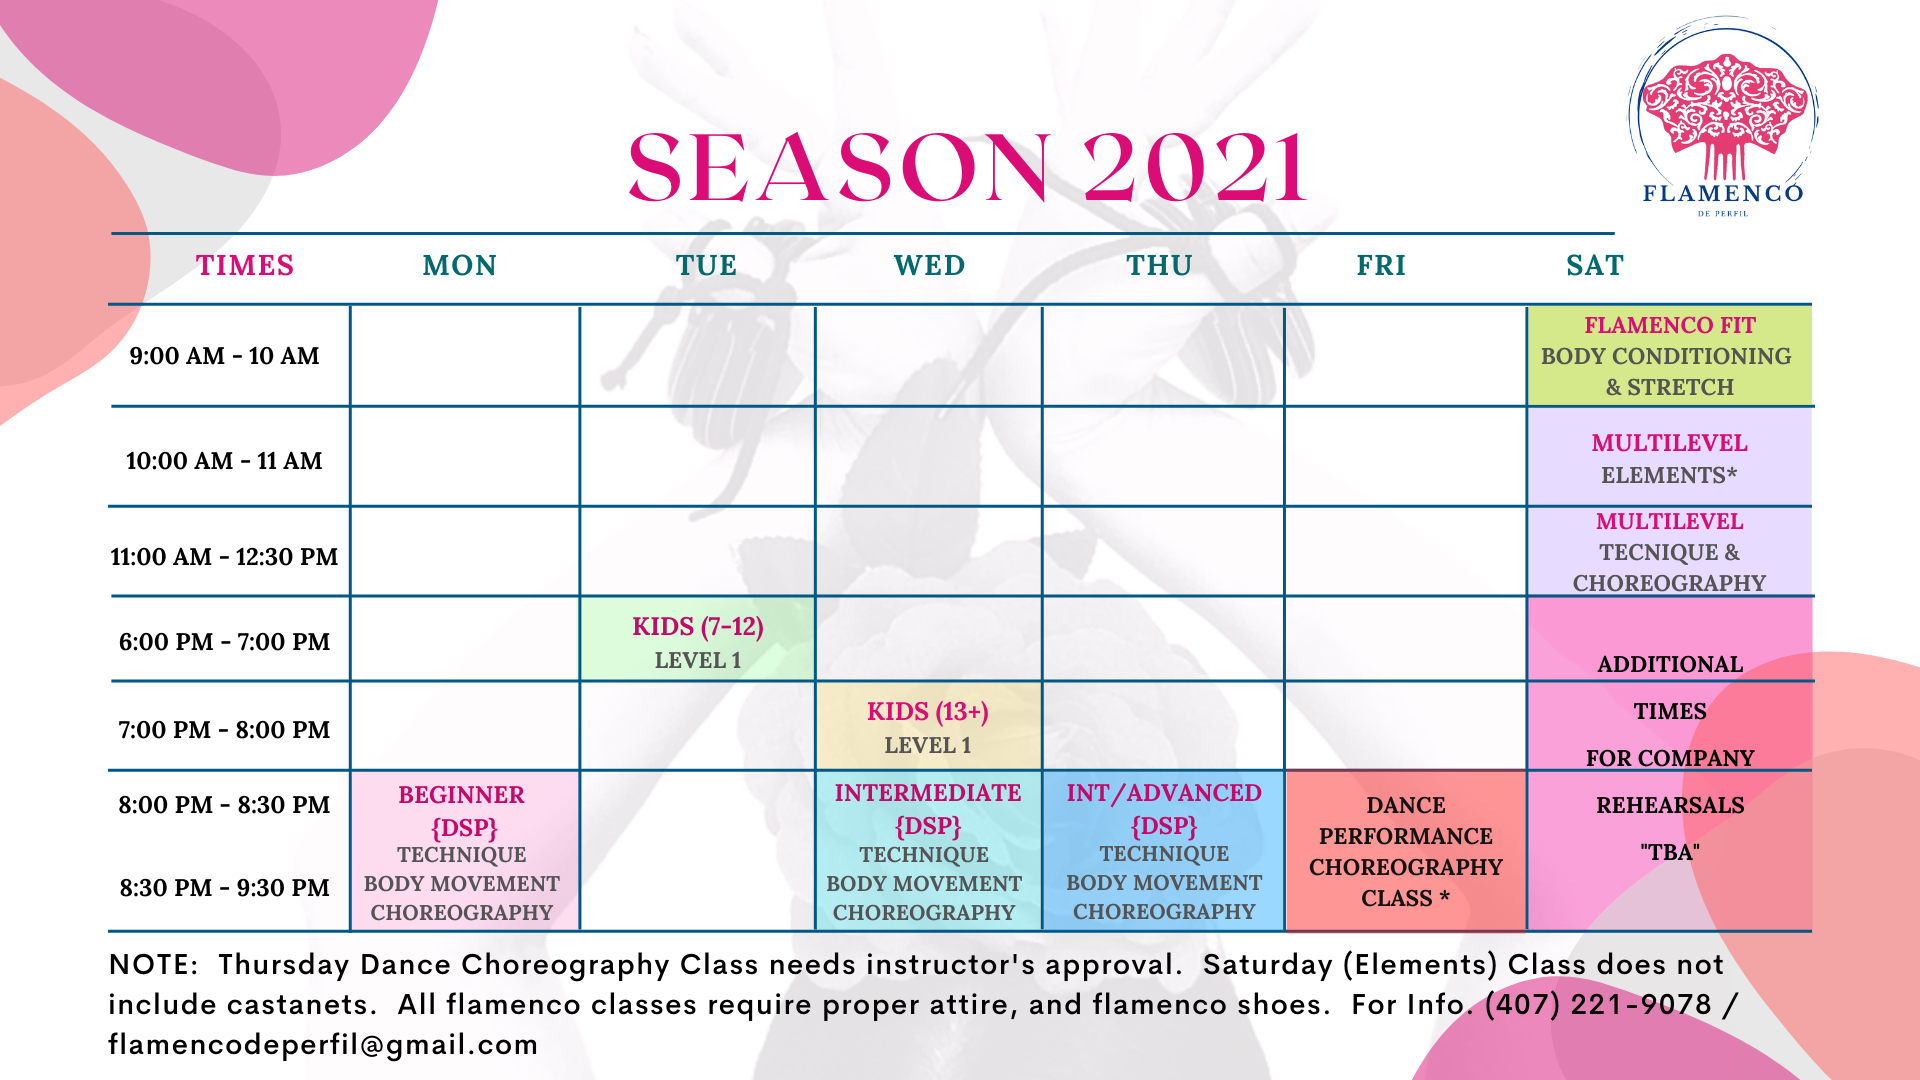 season 2021 - Calendar